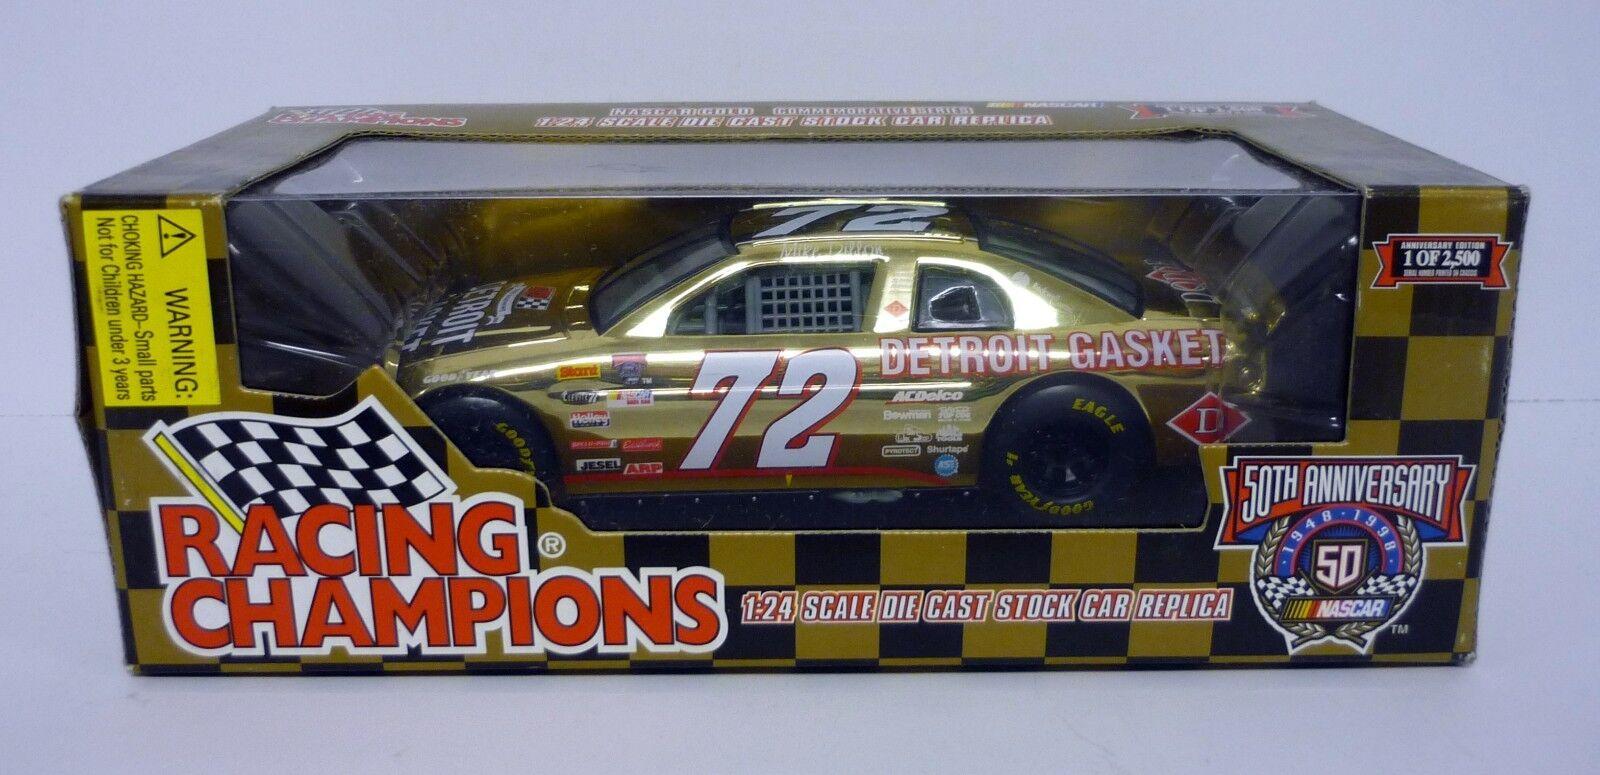 RACING CHAMPIONS NASCAR Detroit Gasket 1 24 Die-Cast MIB Mike Dillon 1998